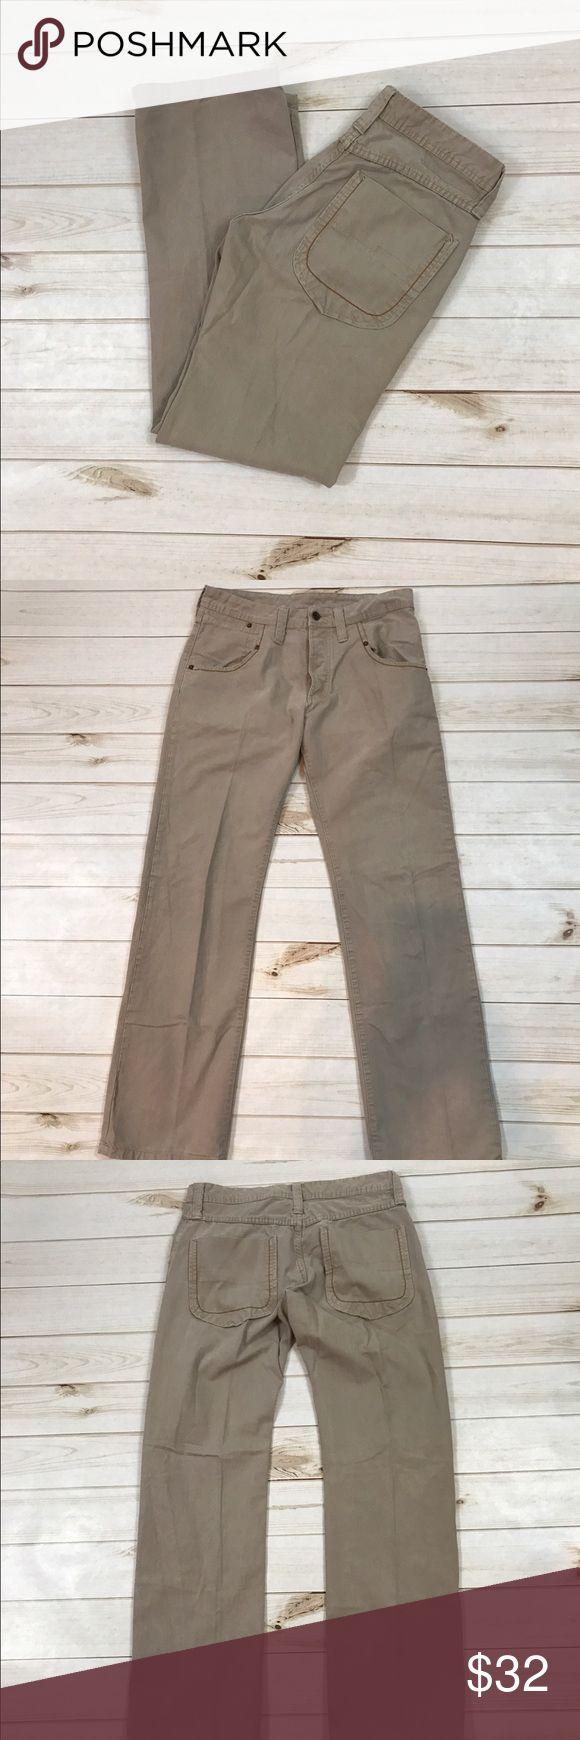 "Zara Men's Kaki Jeans Size 34 Zara Men's Kaki Button Up Jeans Size 34. 41.4"" length, 32.5"" Inseam. Used but in fairly good condition. Zara Jeans Straight"